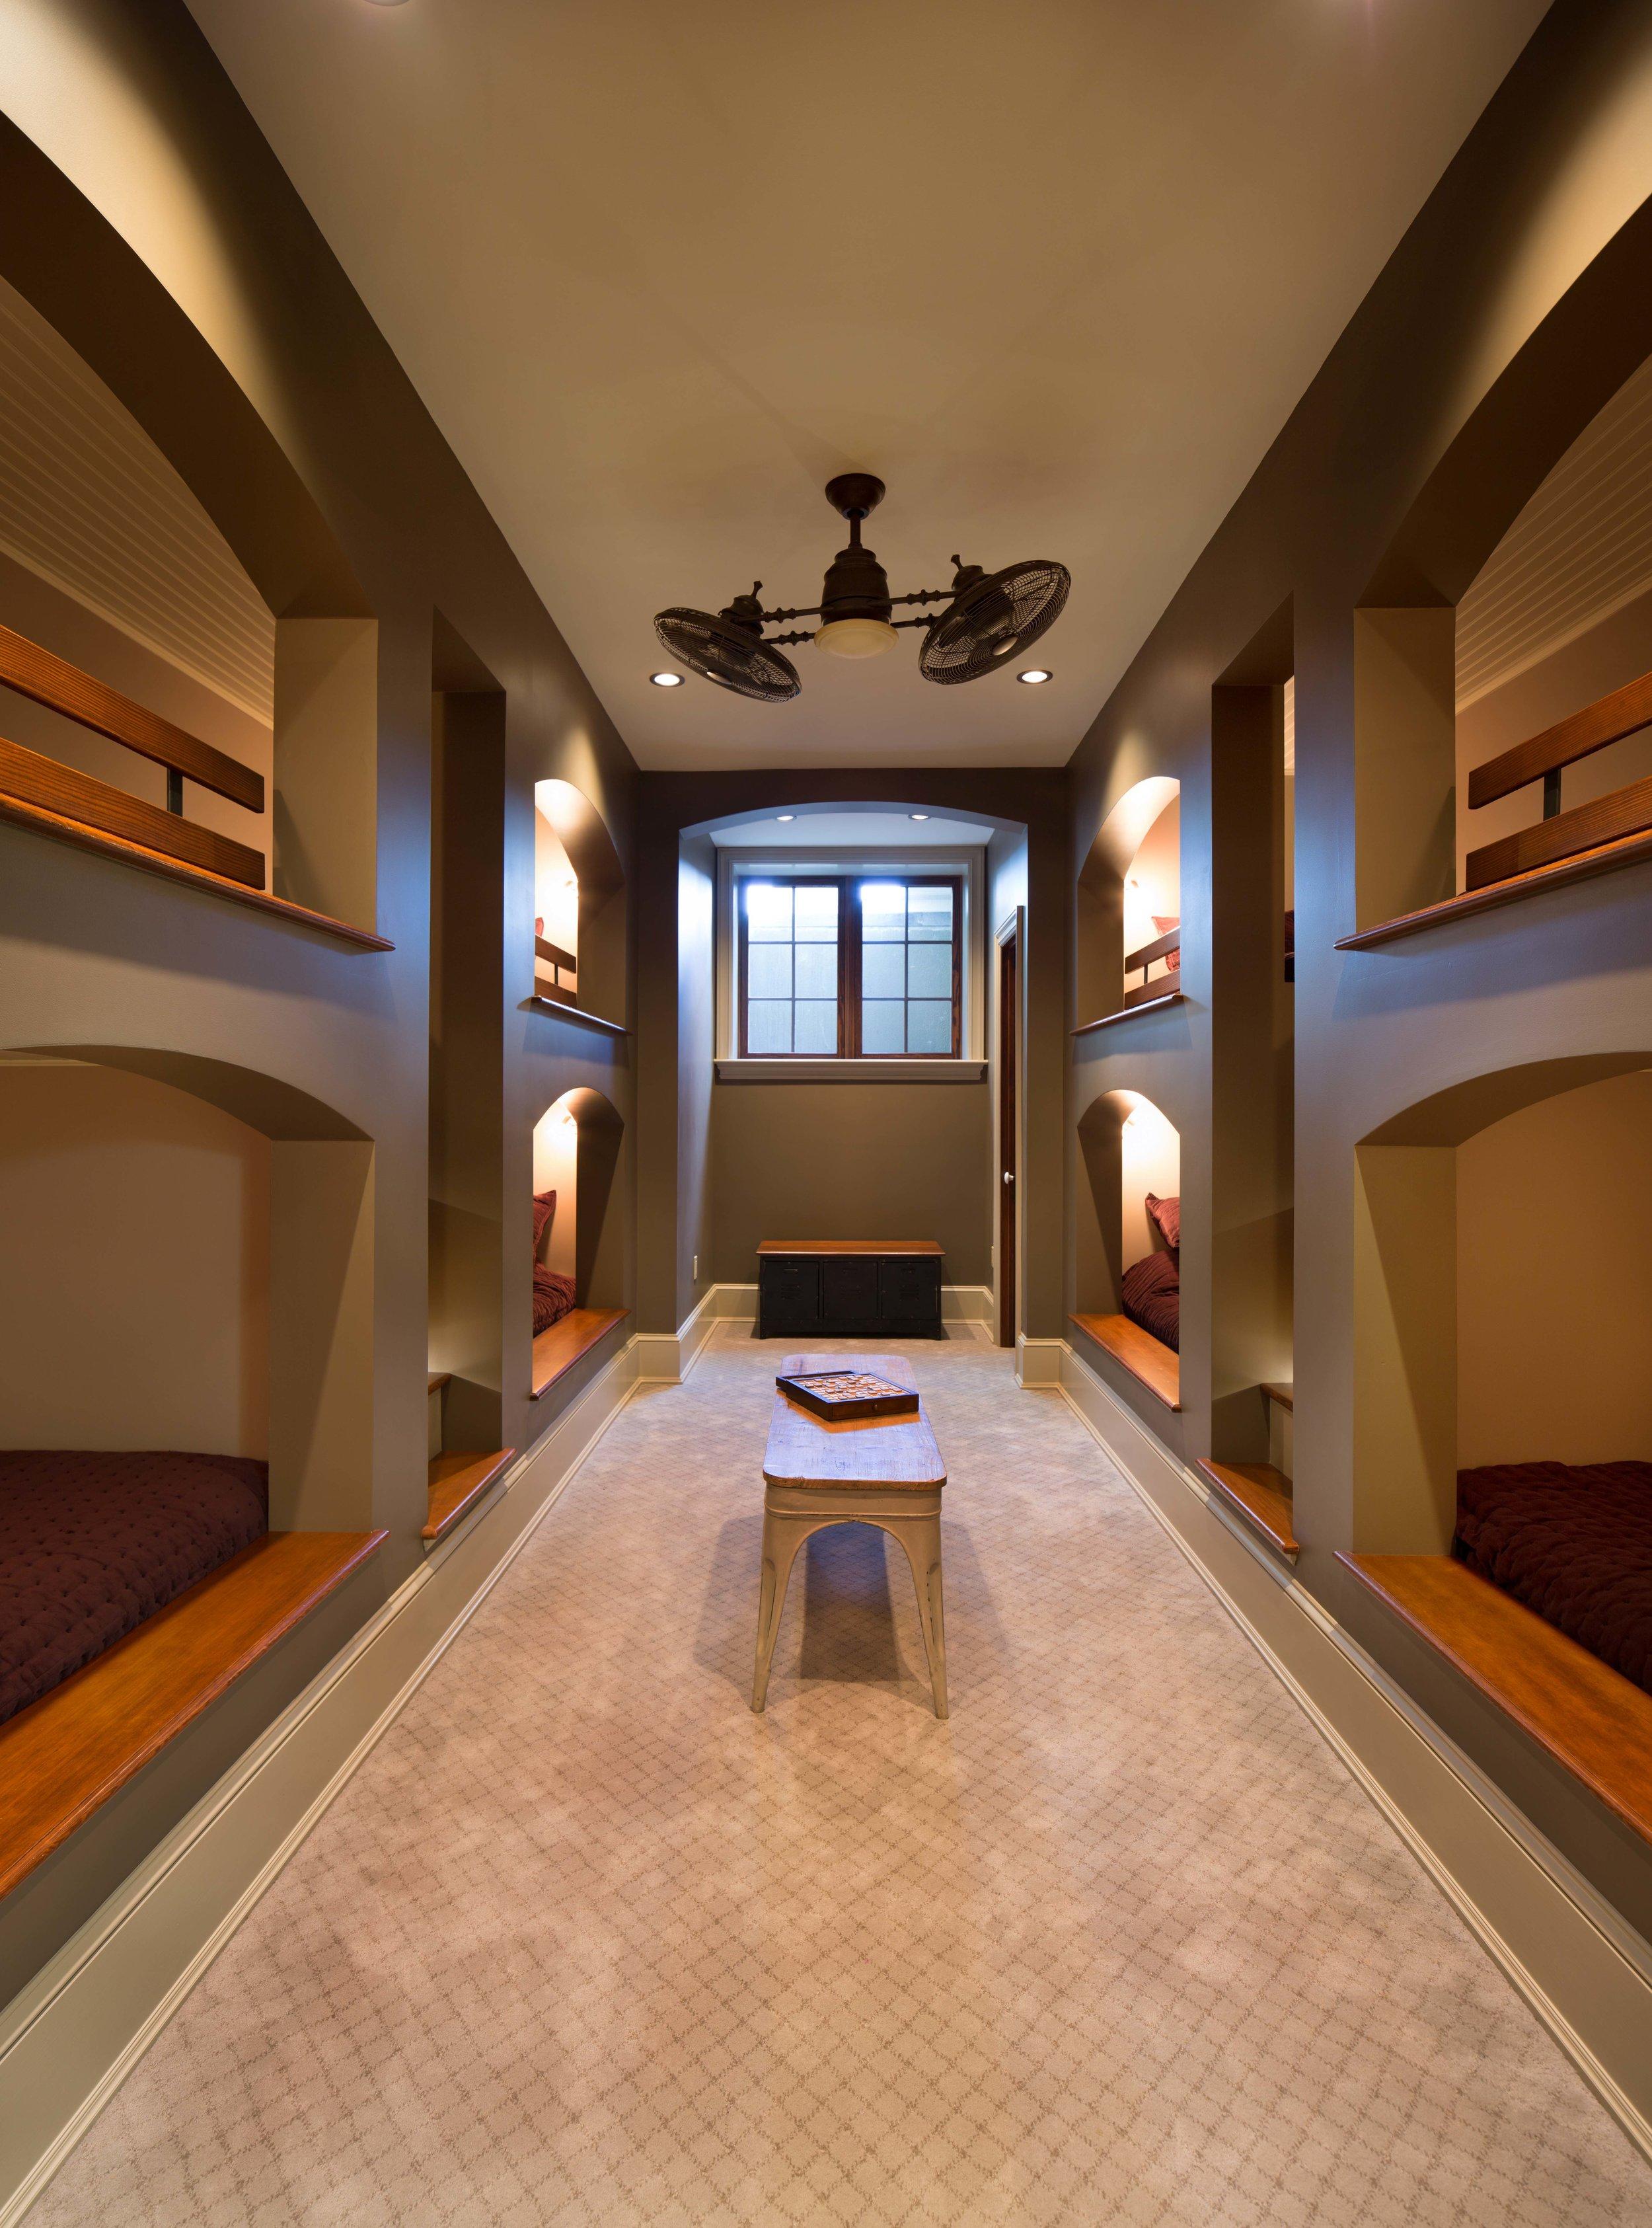 Corcoran-Bunk Room 2.jpg